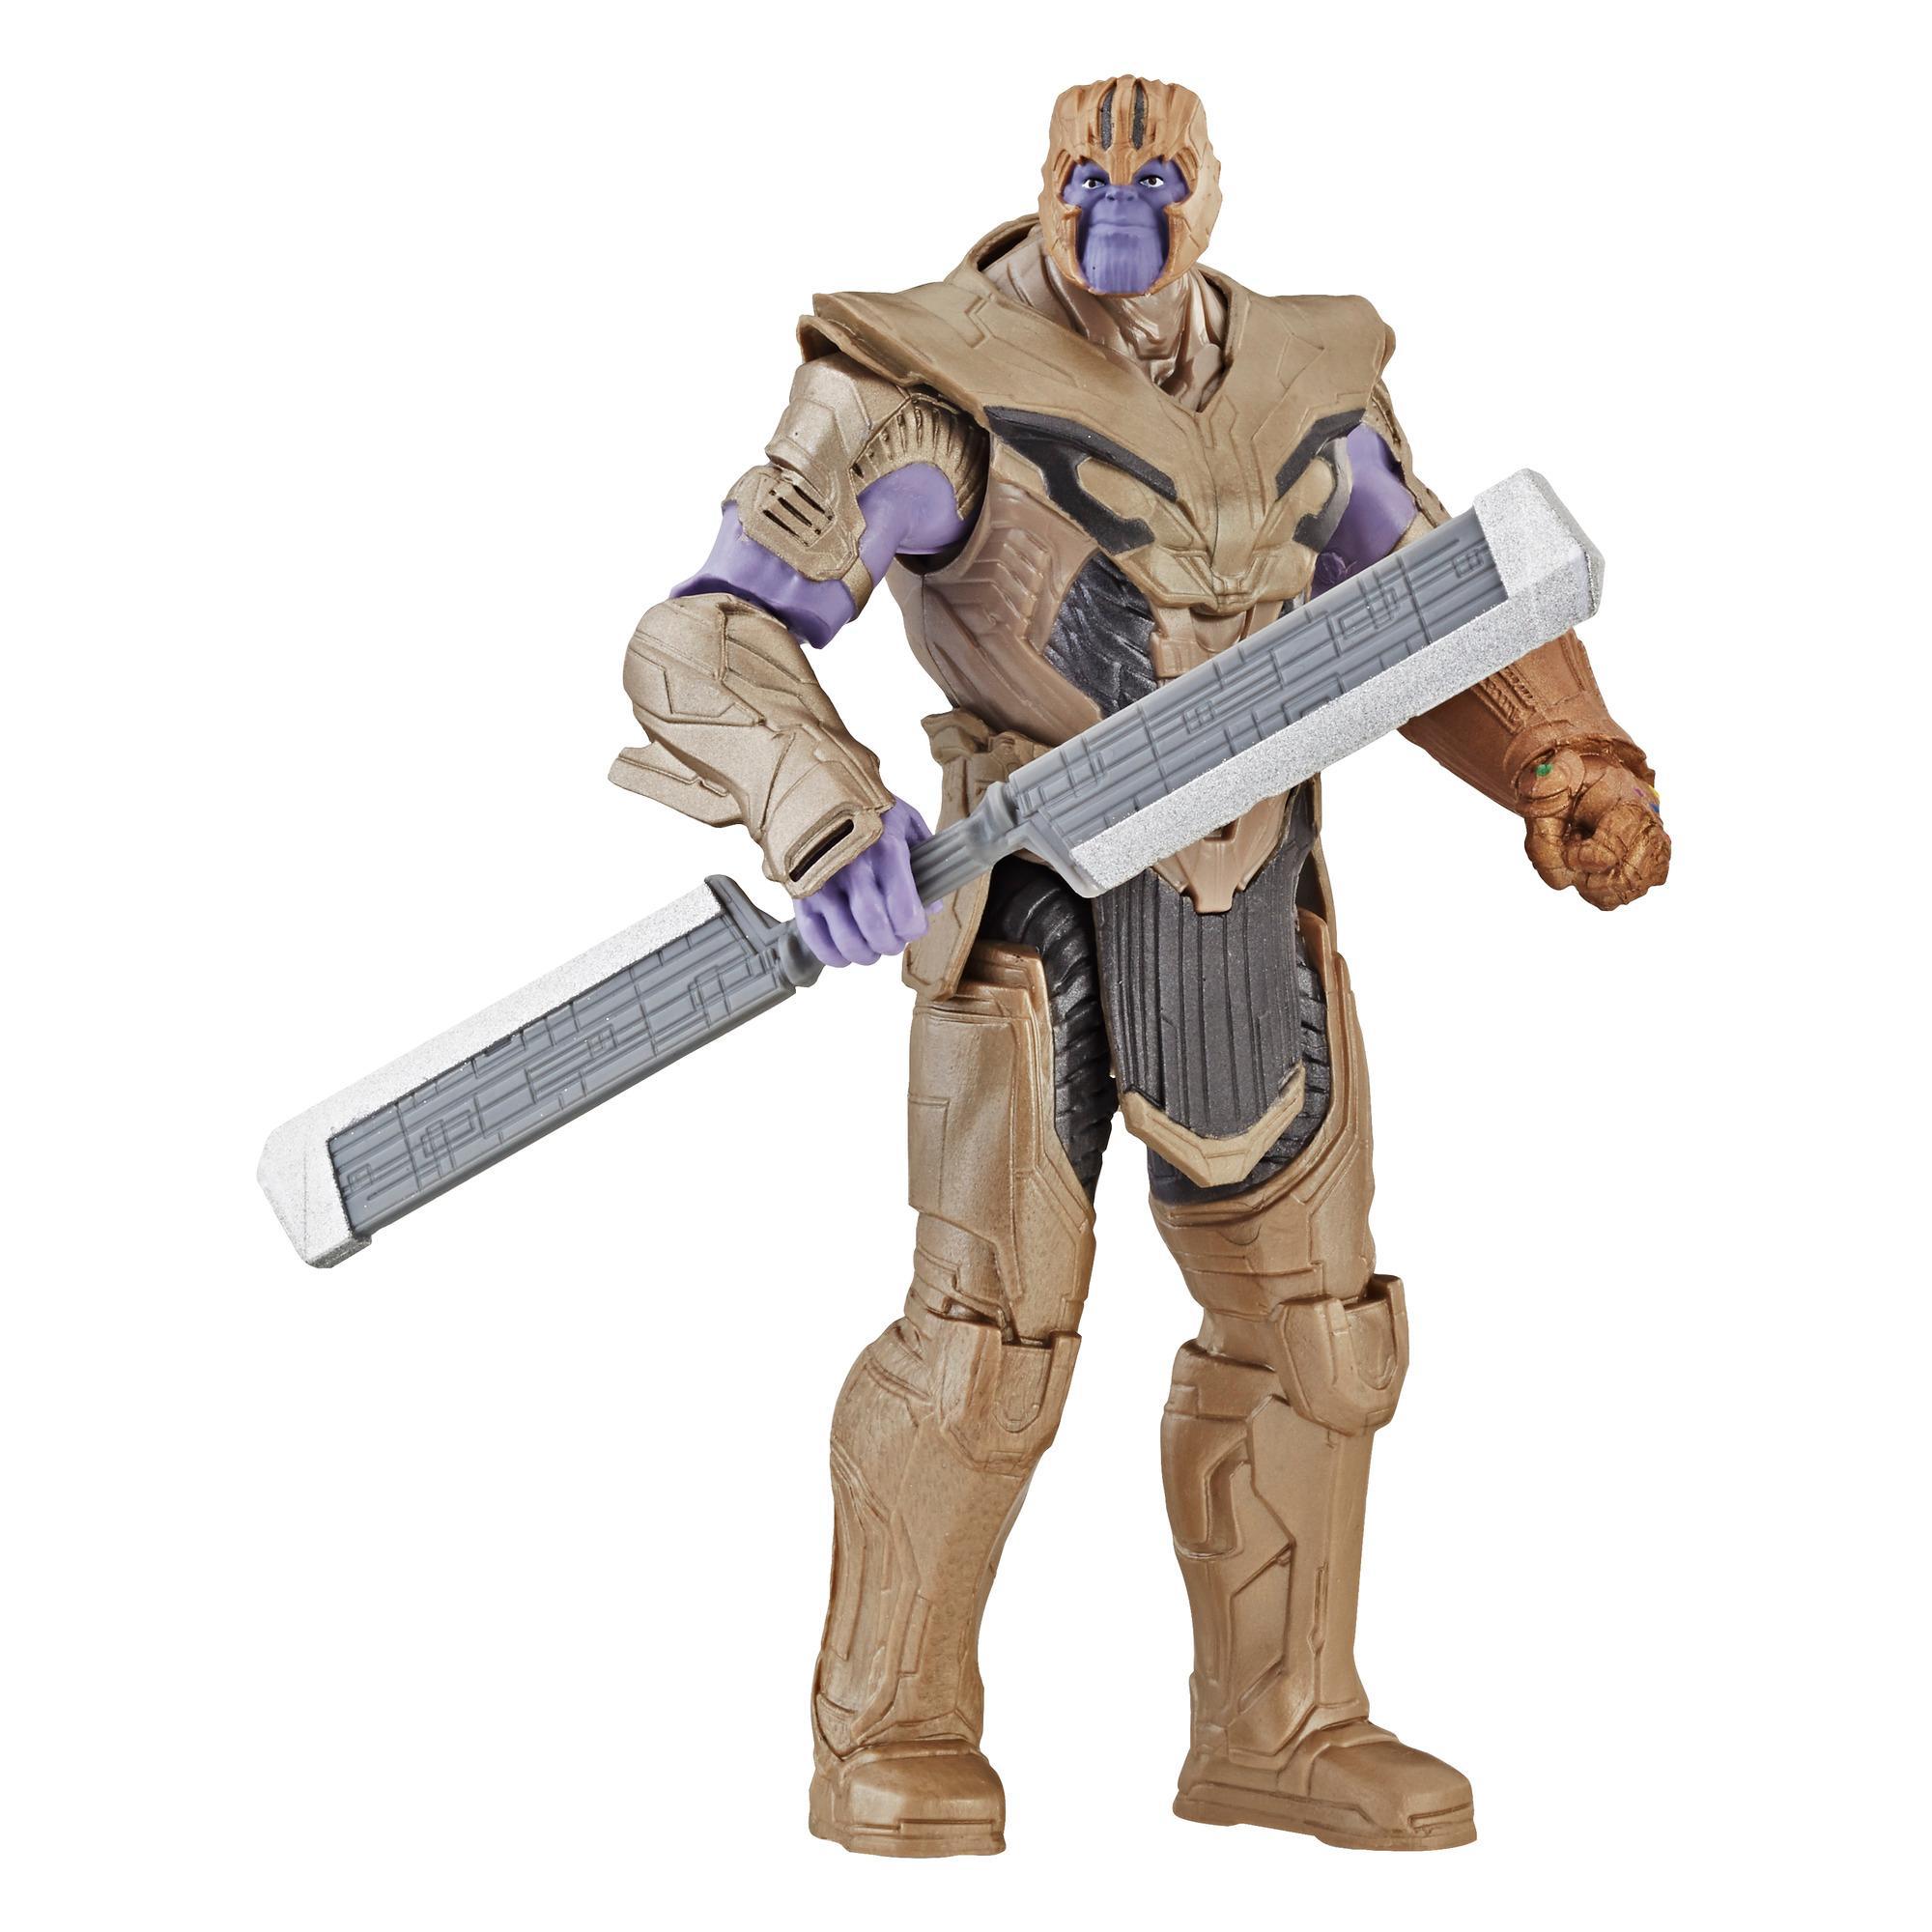 Avengers: Endgame Thanos Özel Figür